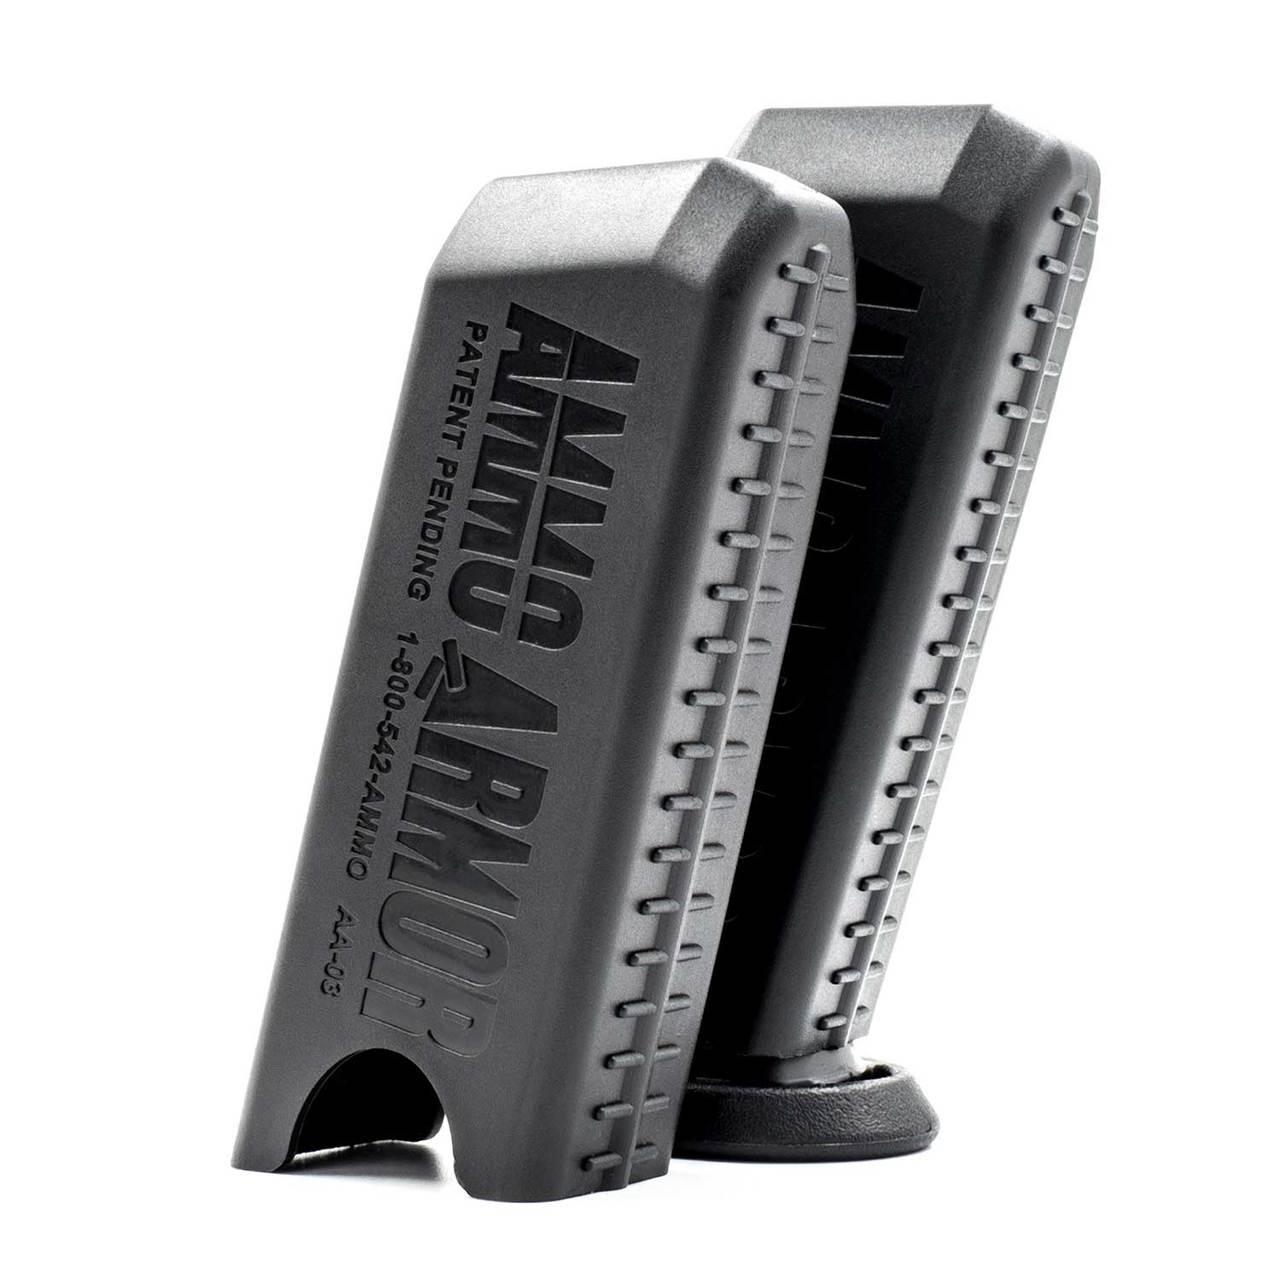 Beretta 92 Compact Magazine